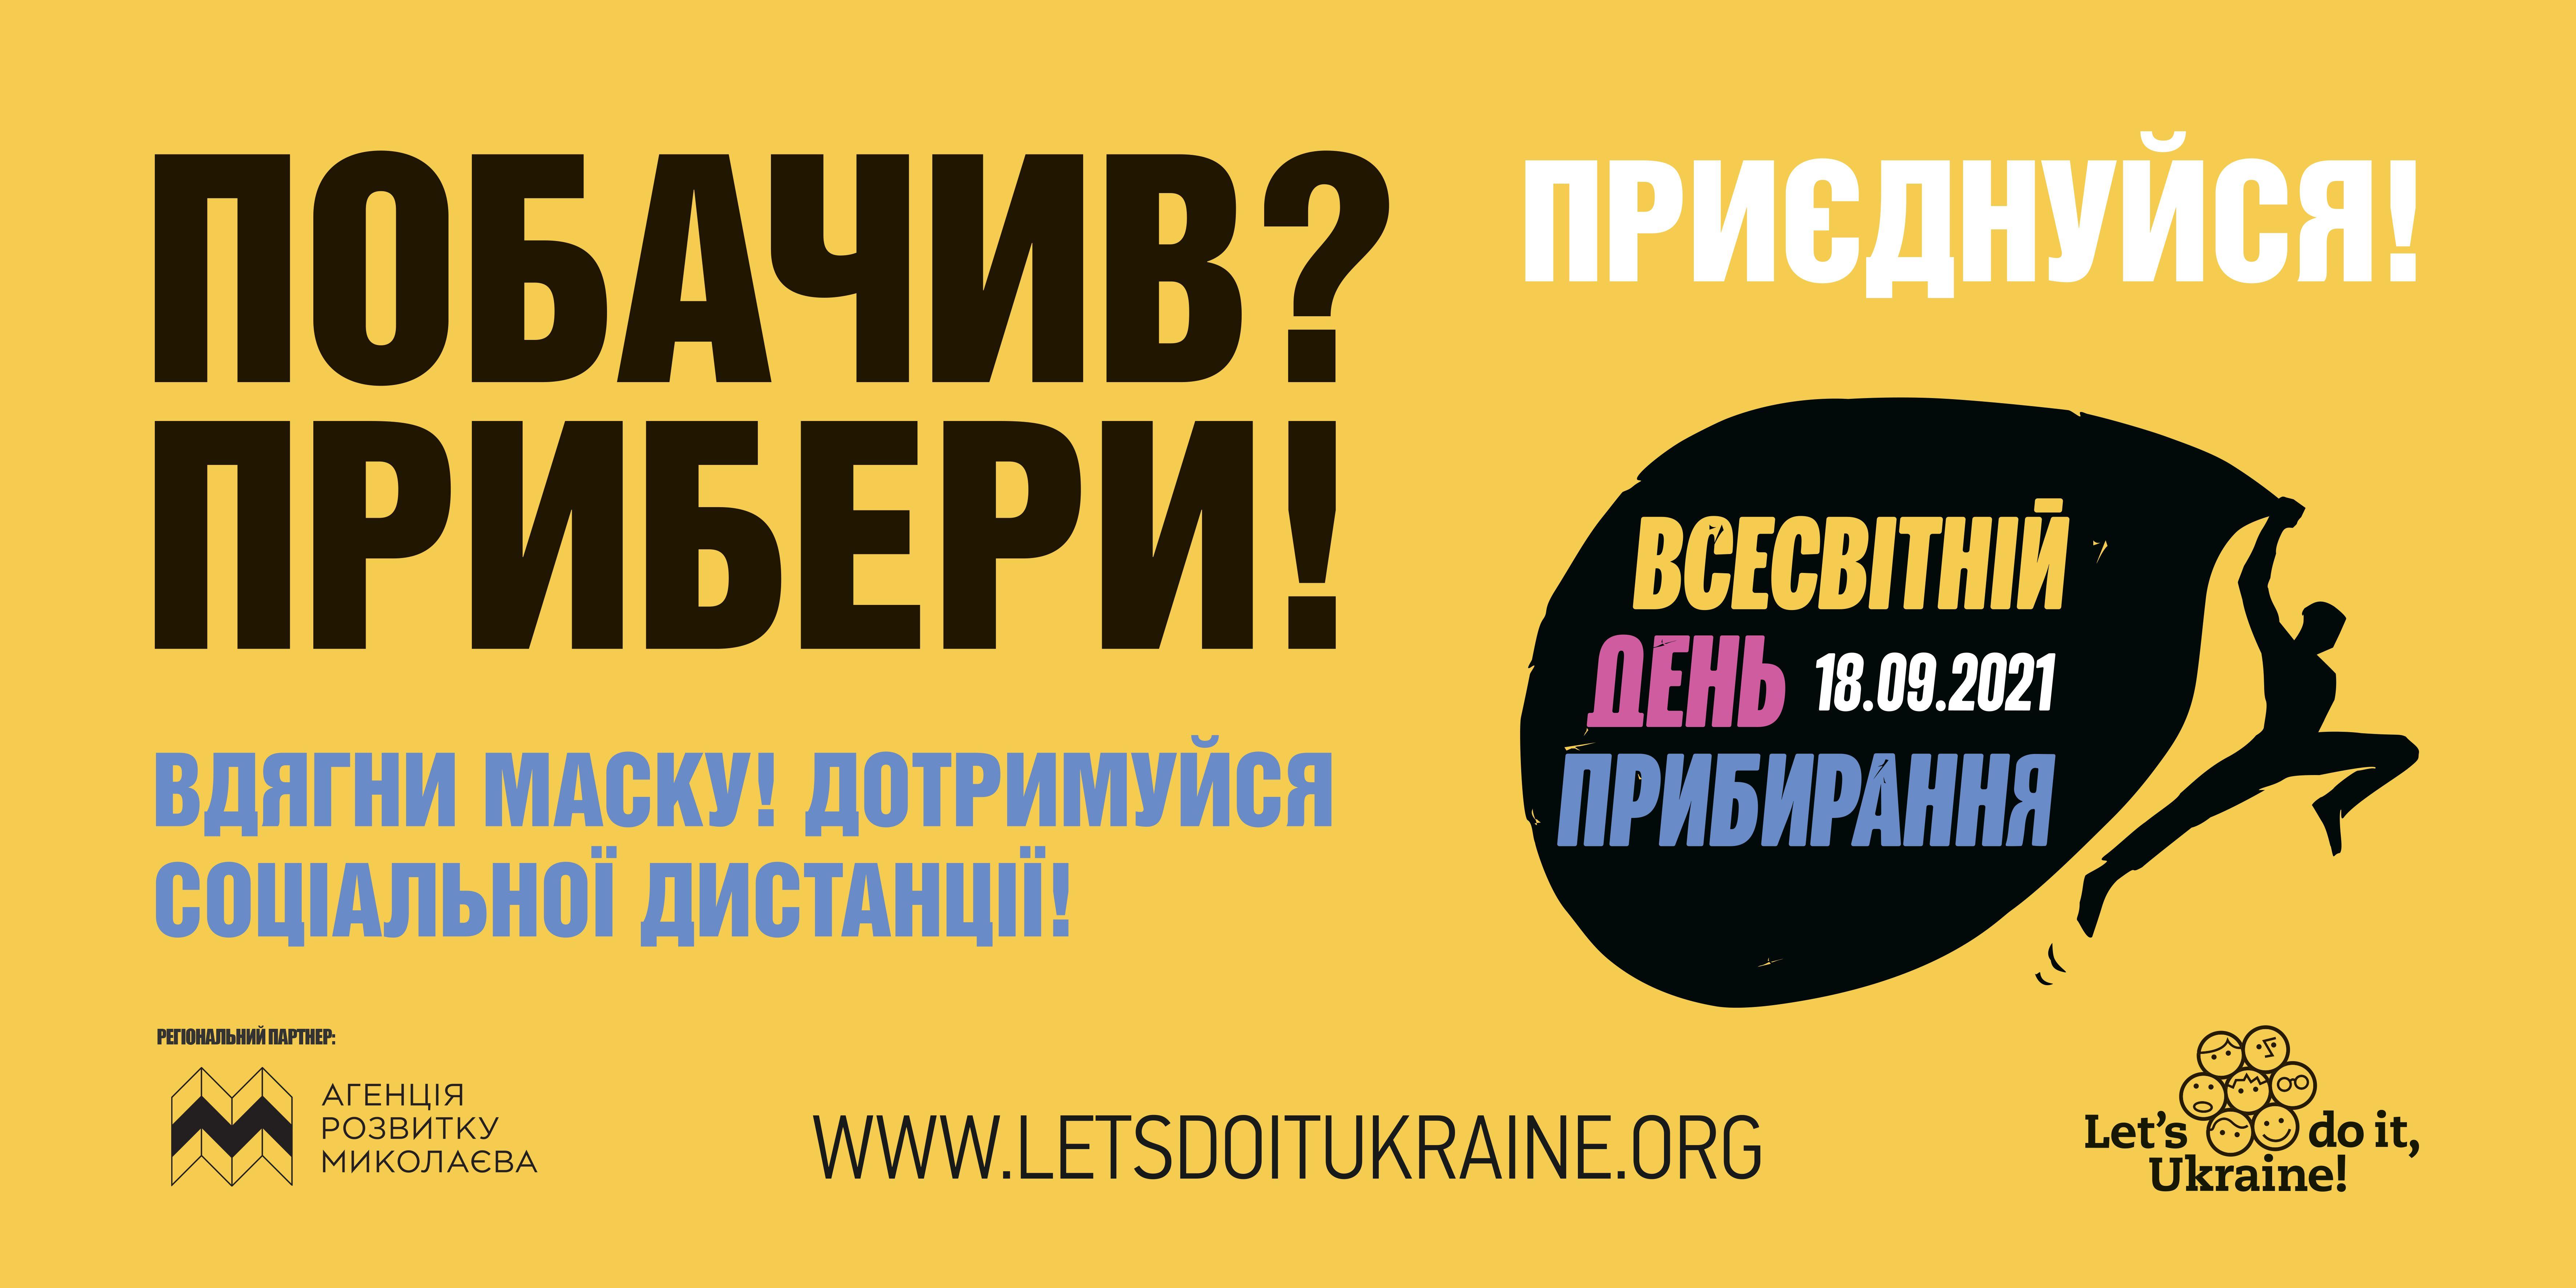 World Cleanup Day: николаевцев приглашают на самую масштабную экологическую акцию года